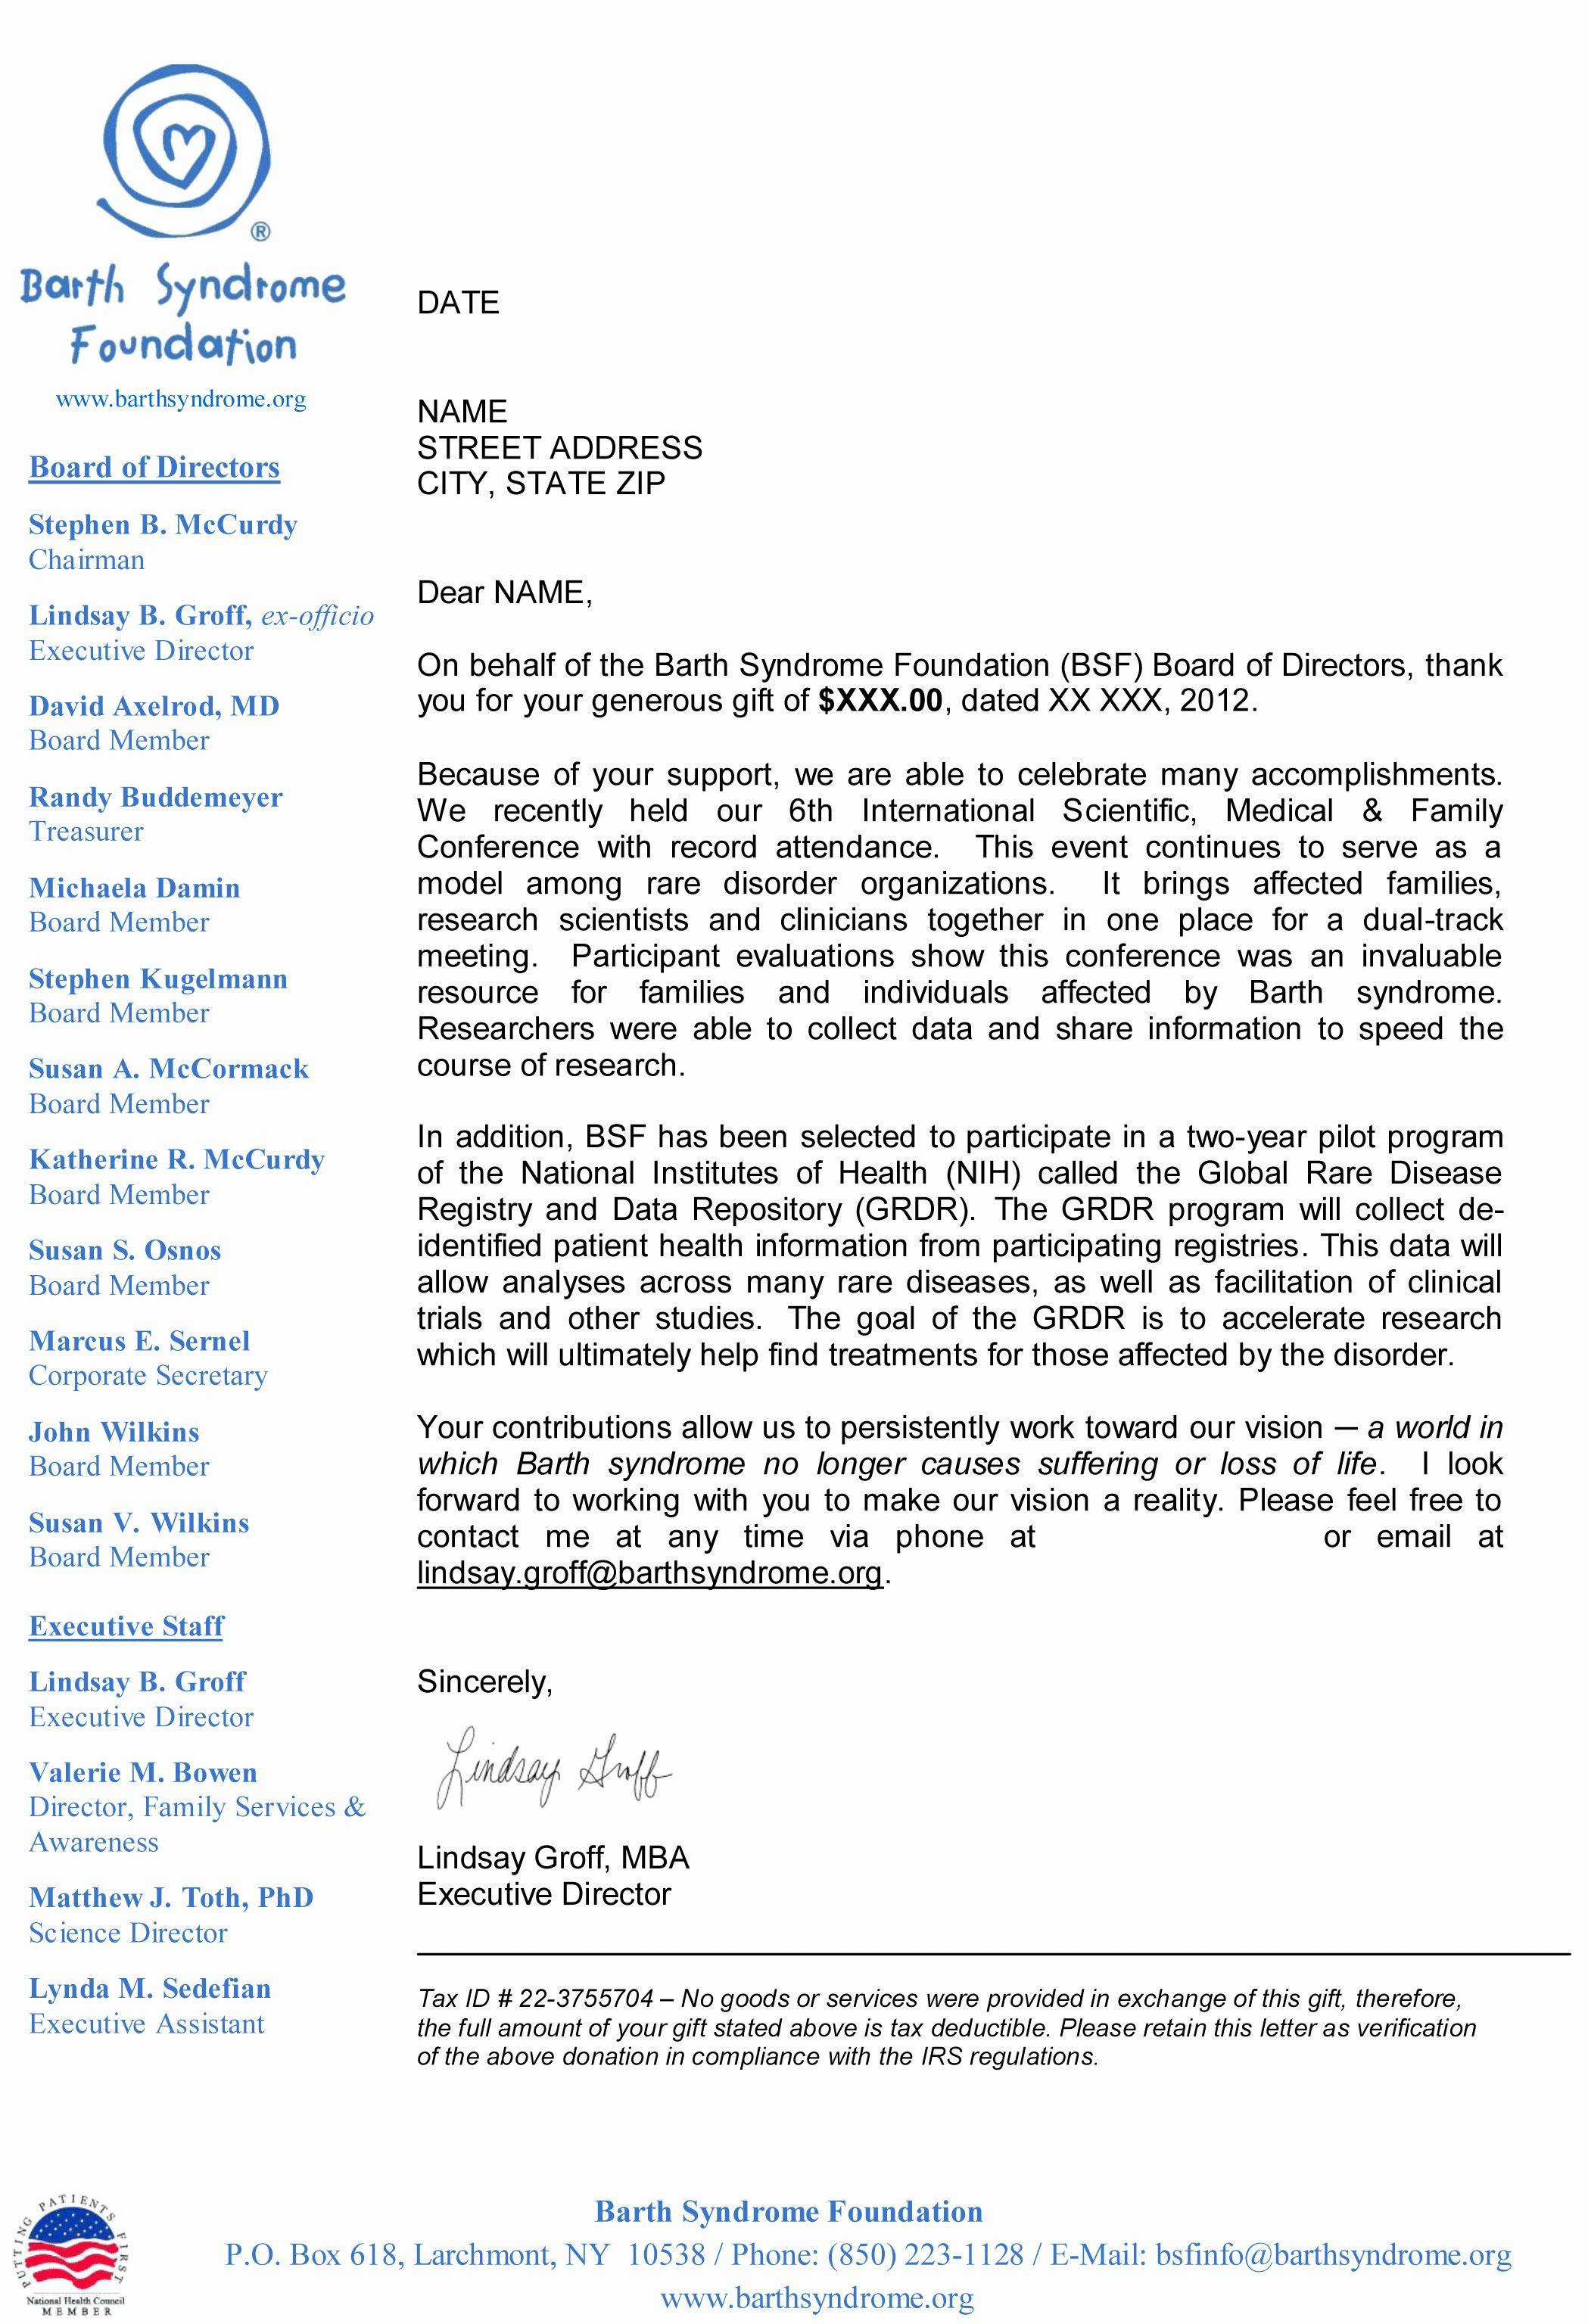 40 Sample Nonprofit Gift Acknowledgement Letter Business Letter